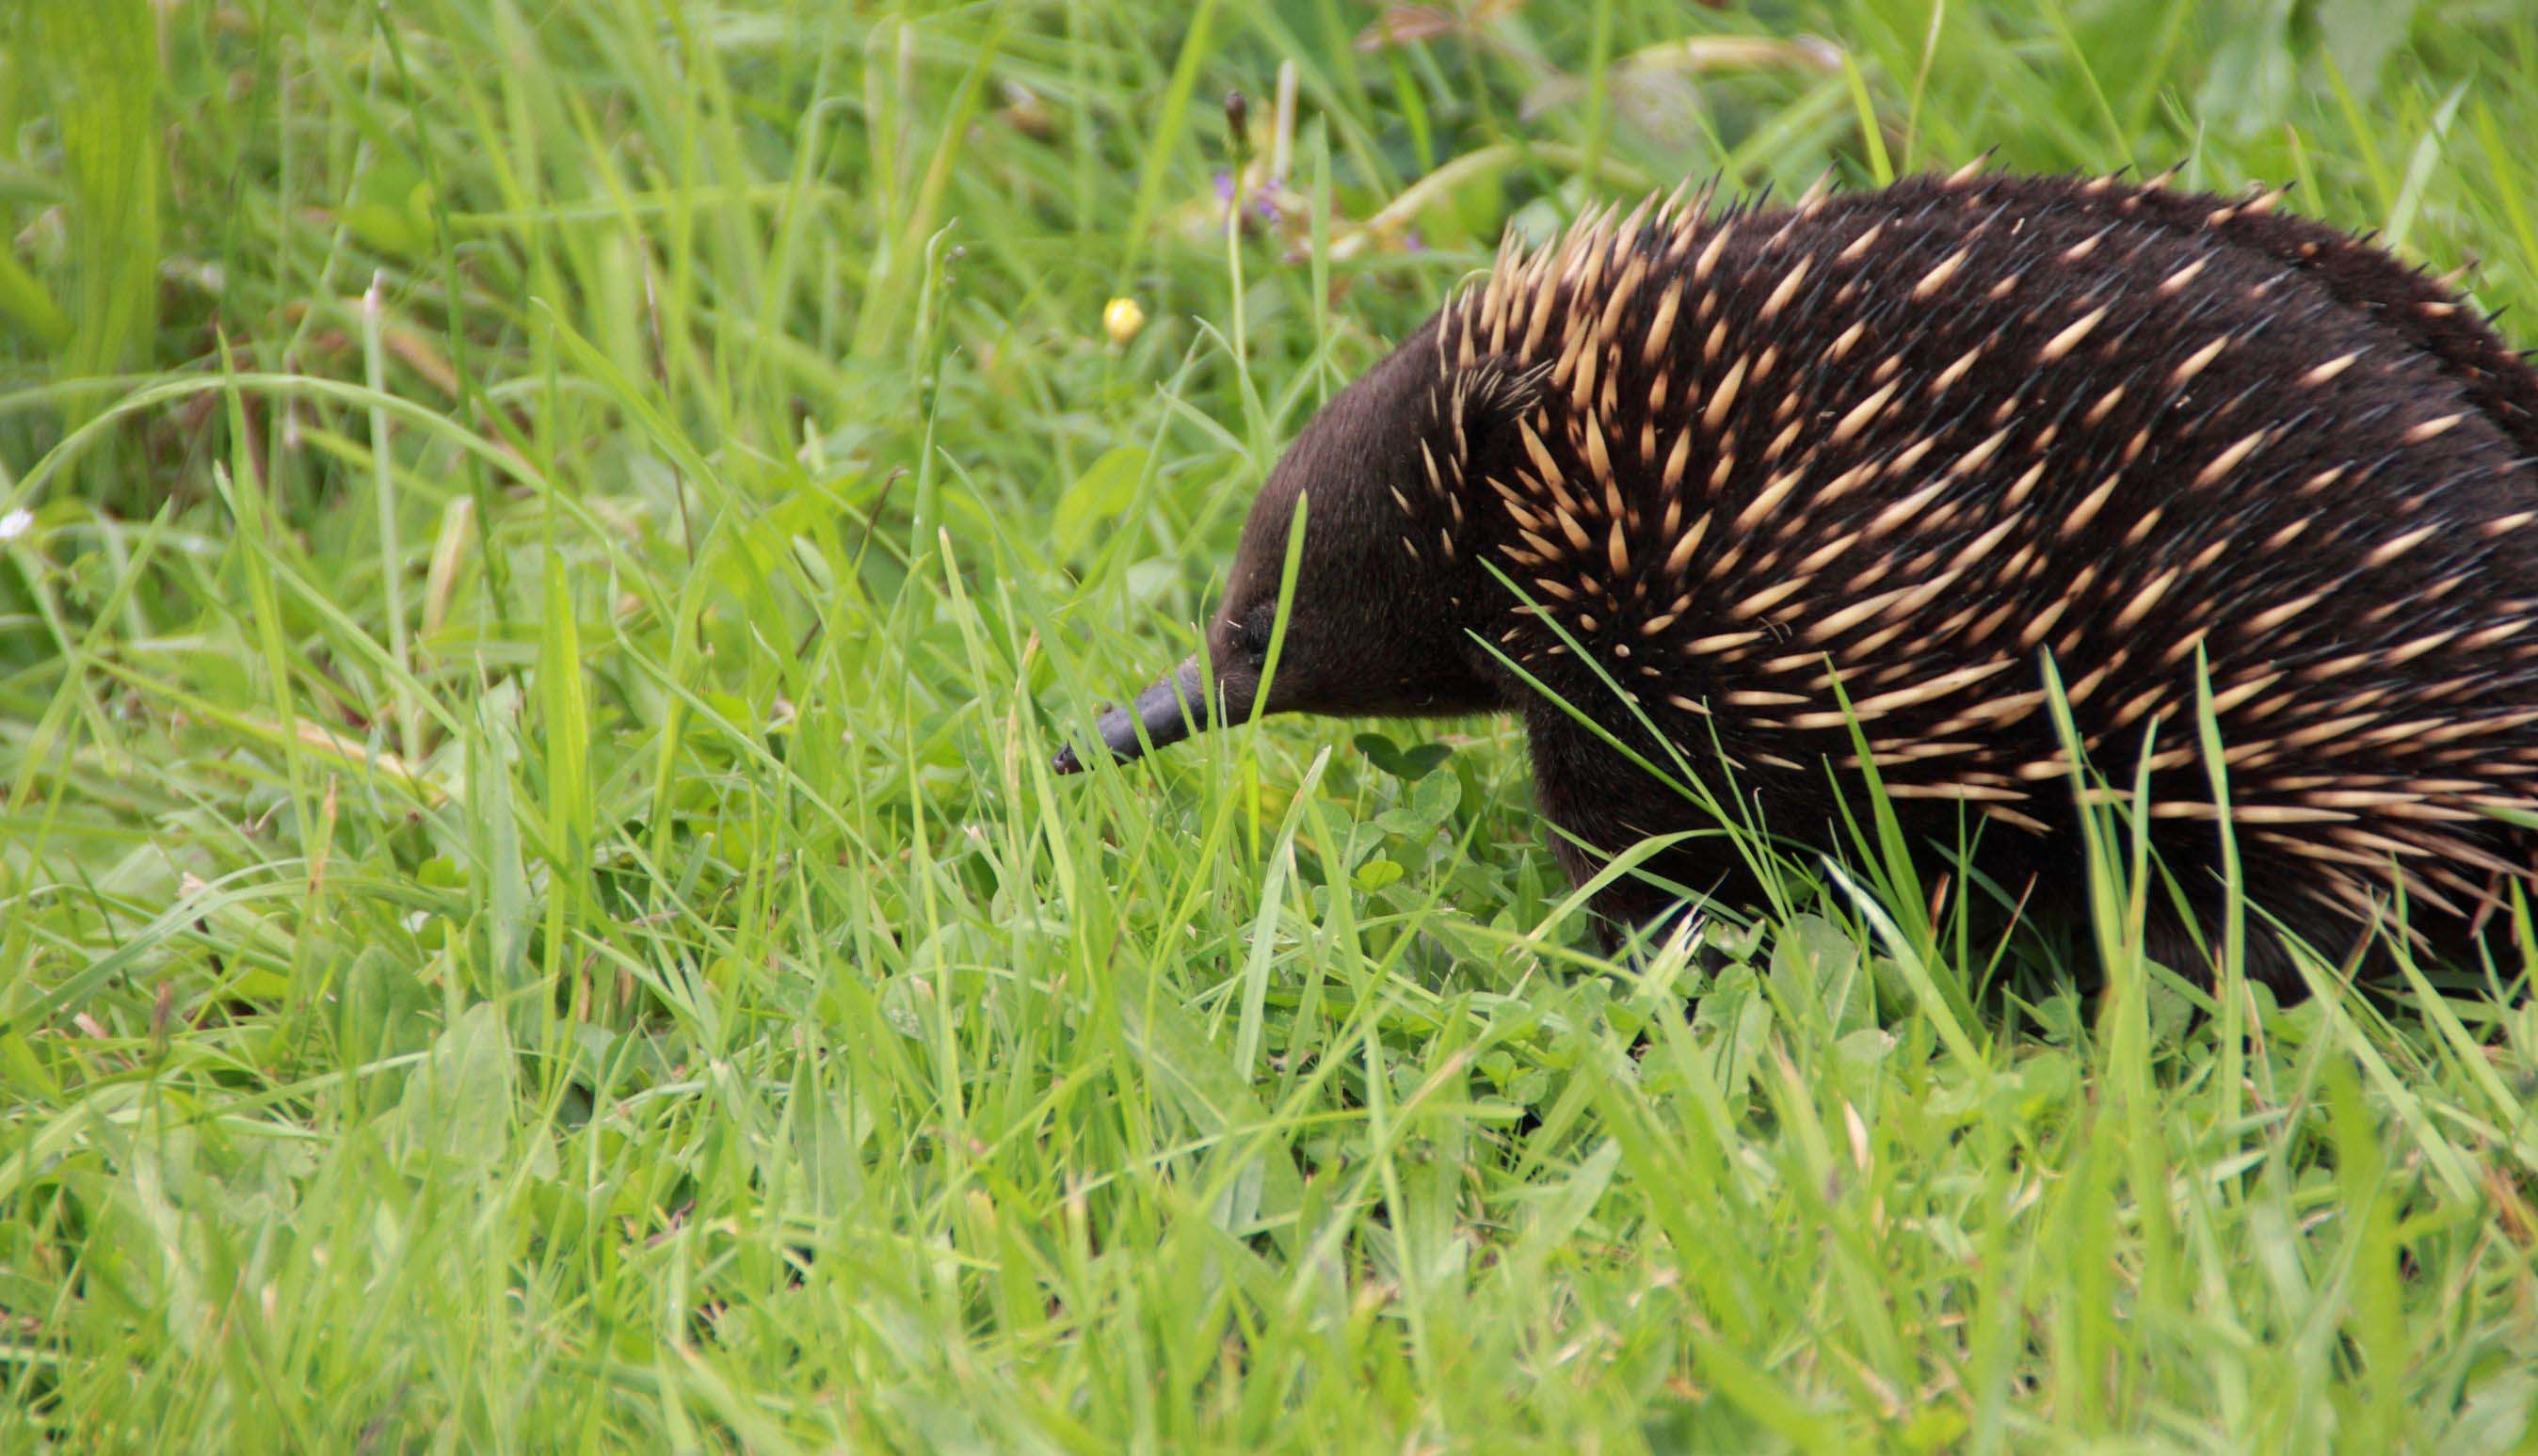 echidna-walking-in-grass-australia